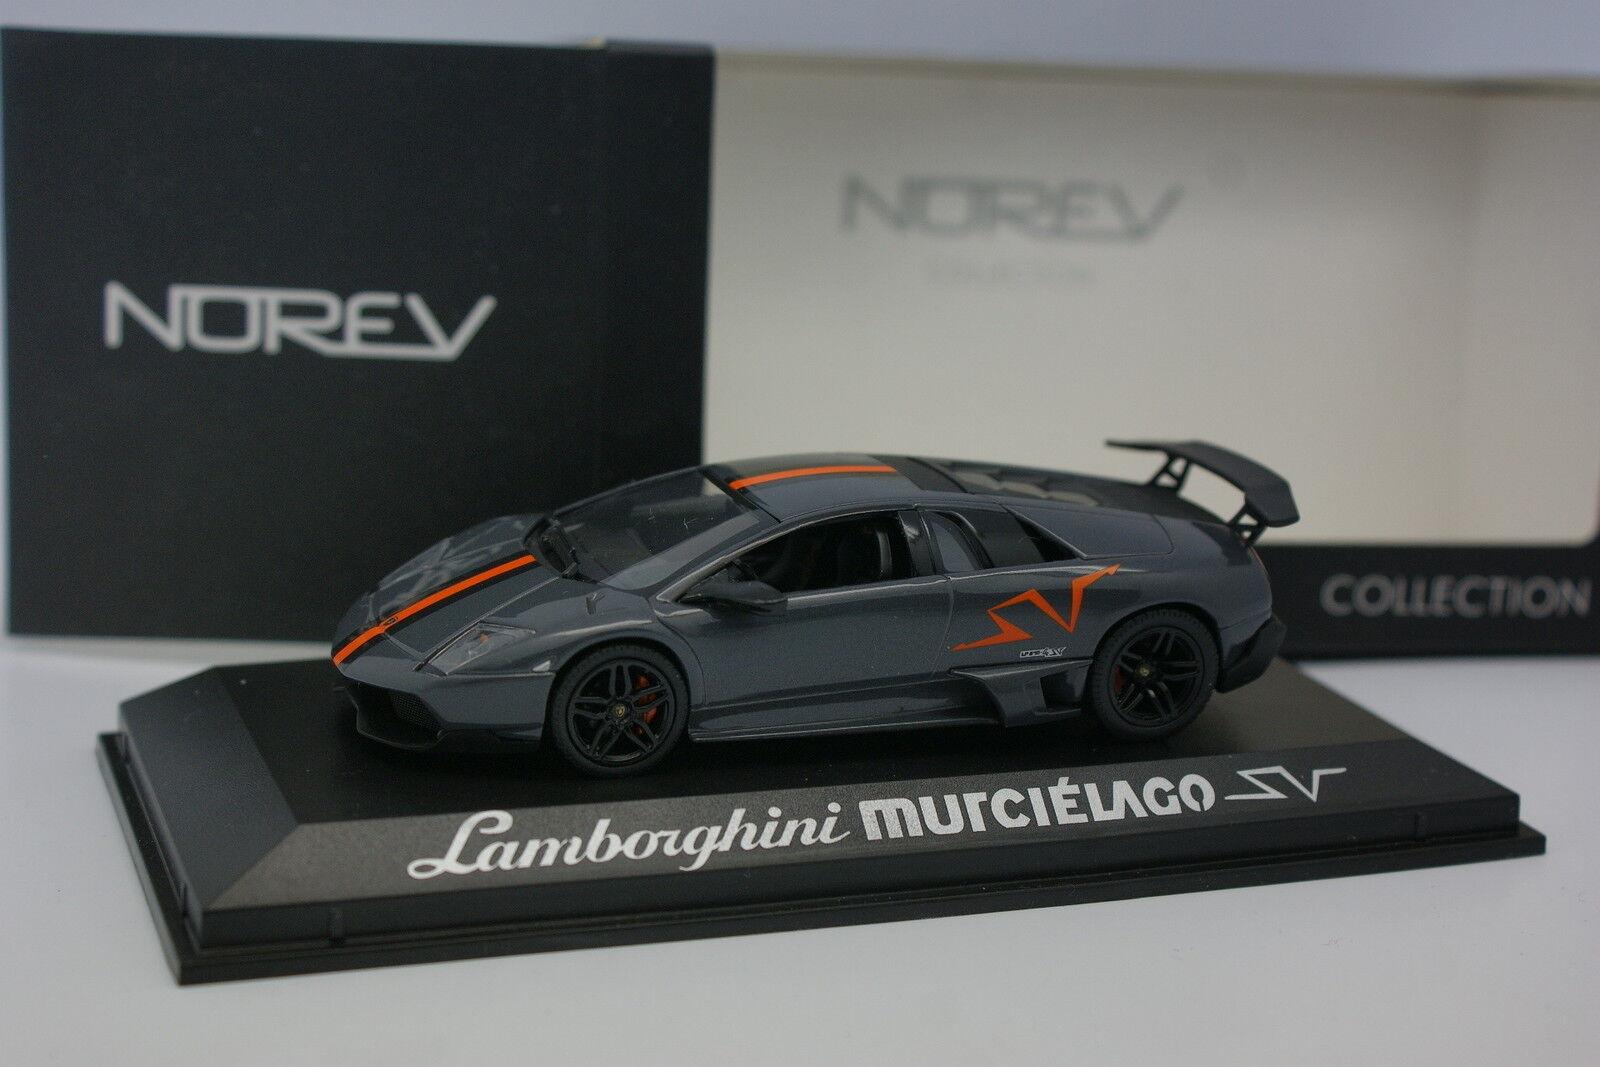 Norev 1 1 1 43 - Lamborghini Murcielago SV f33881